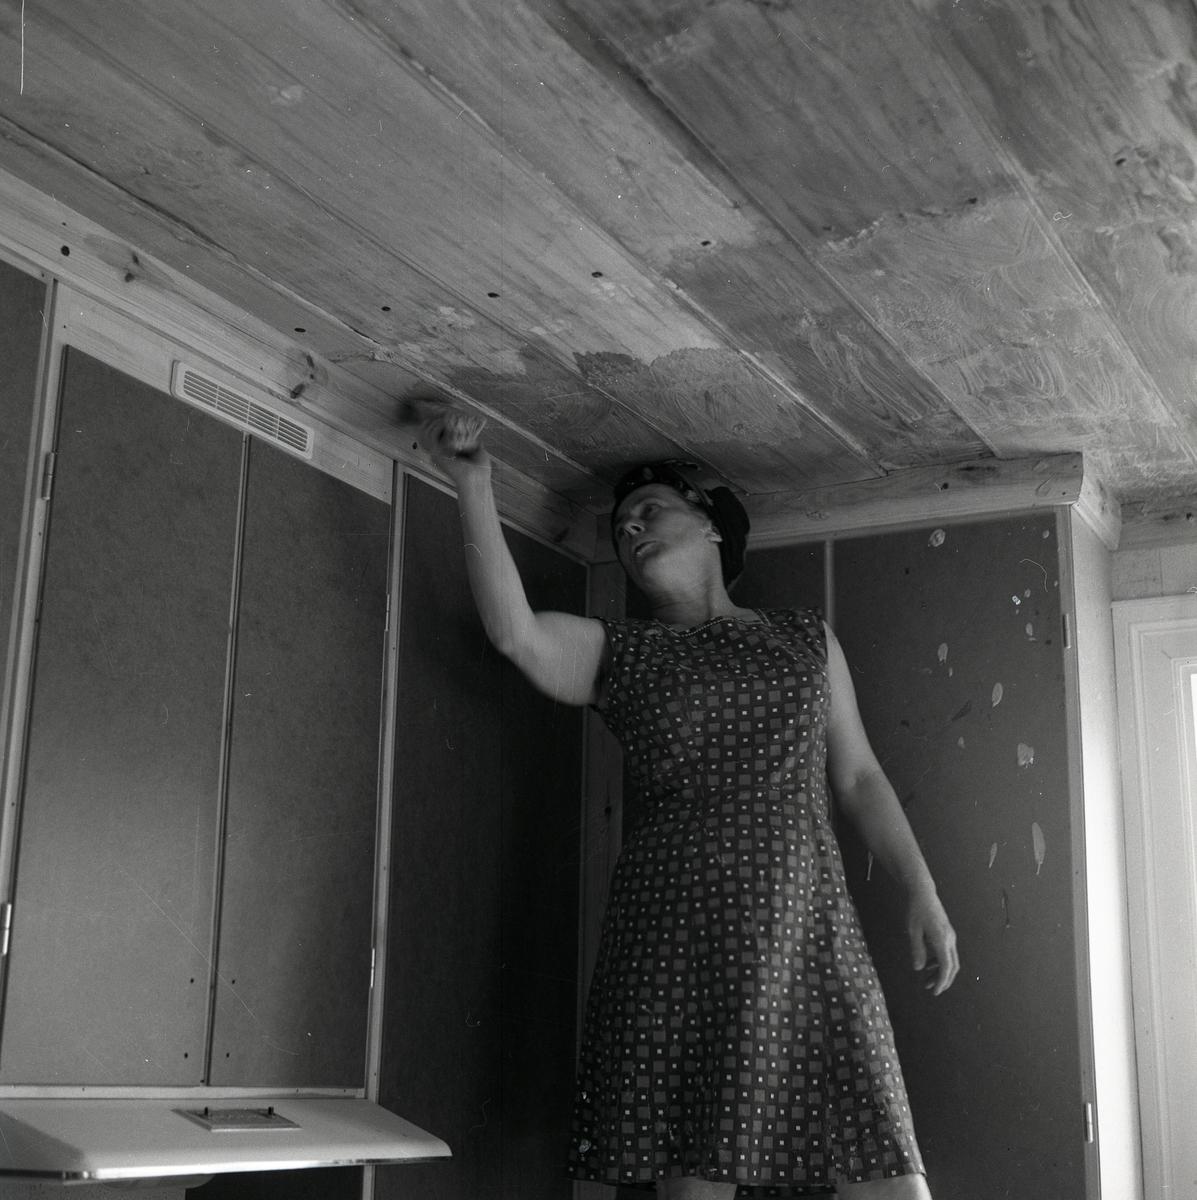 En kvinna skrubbar taket med en skurborste, juni 1968.